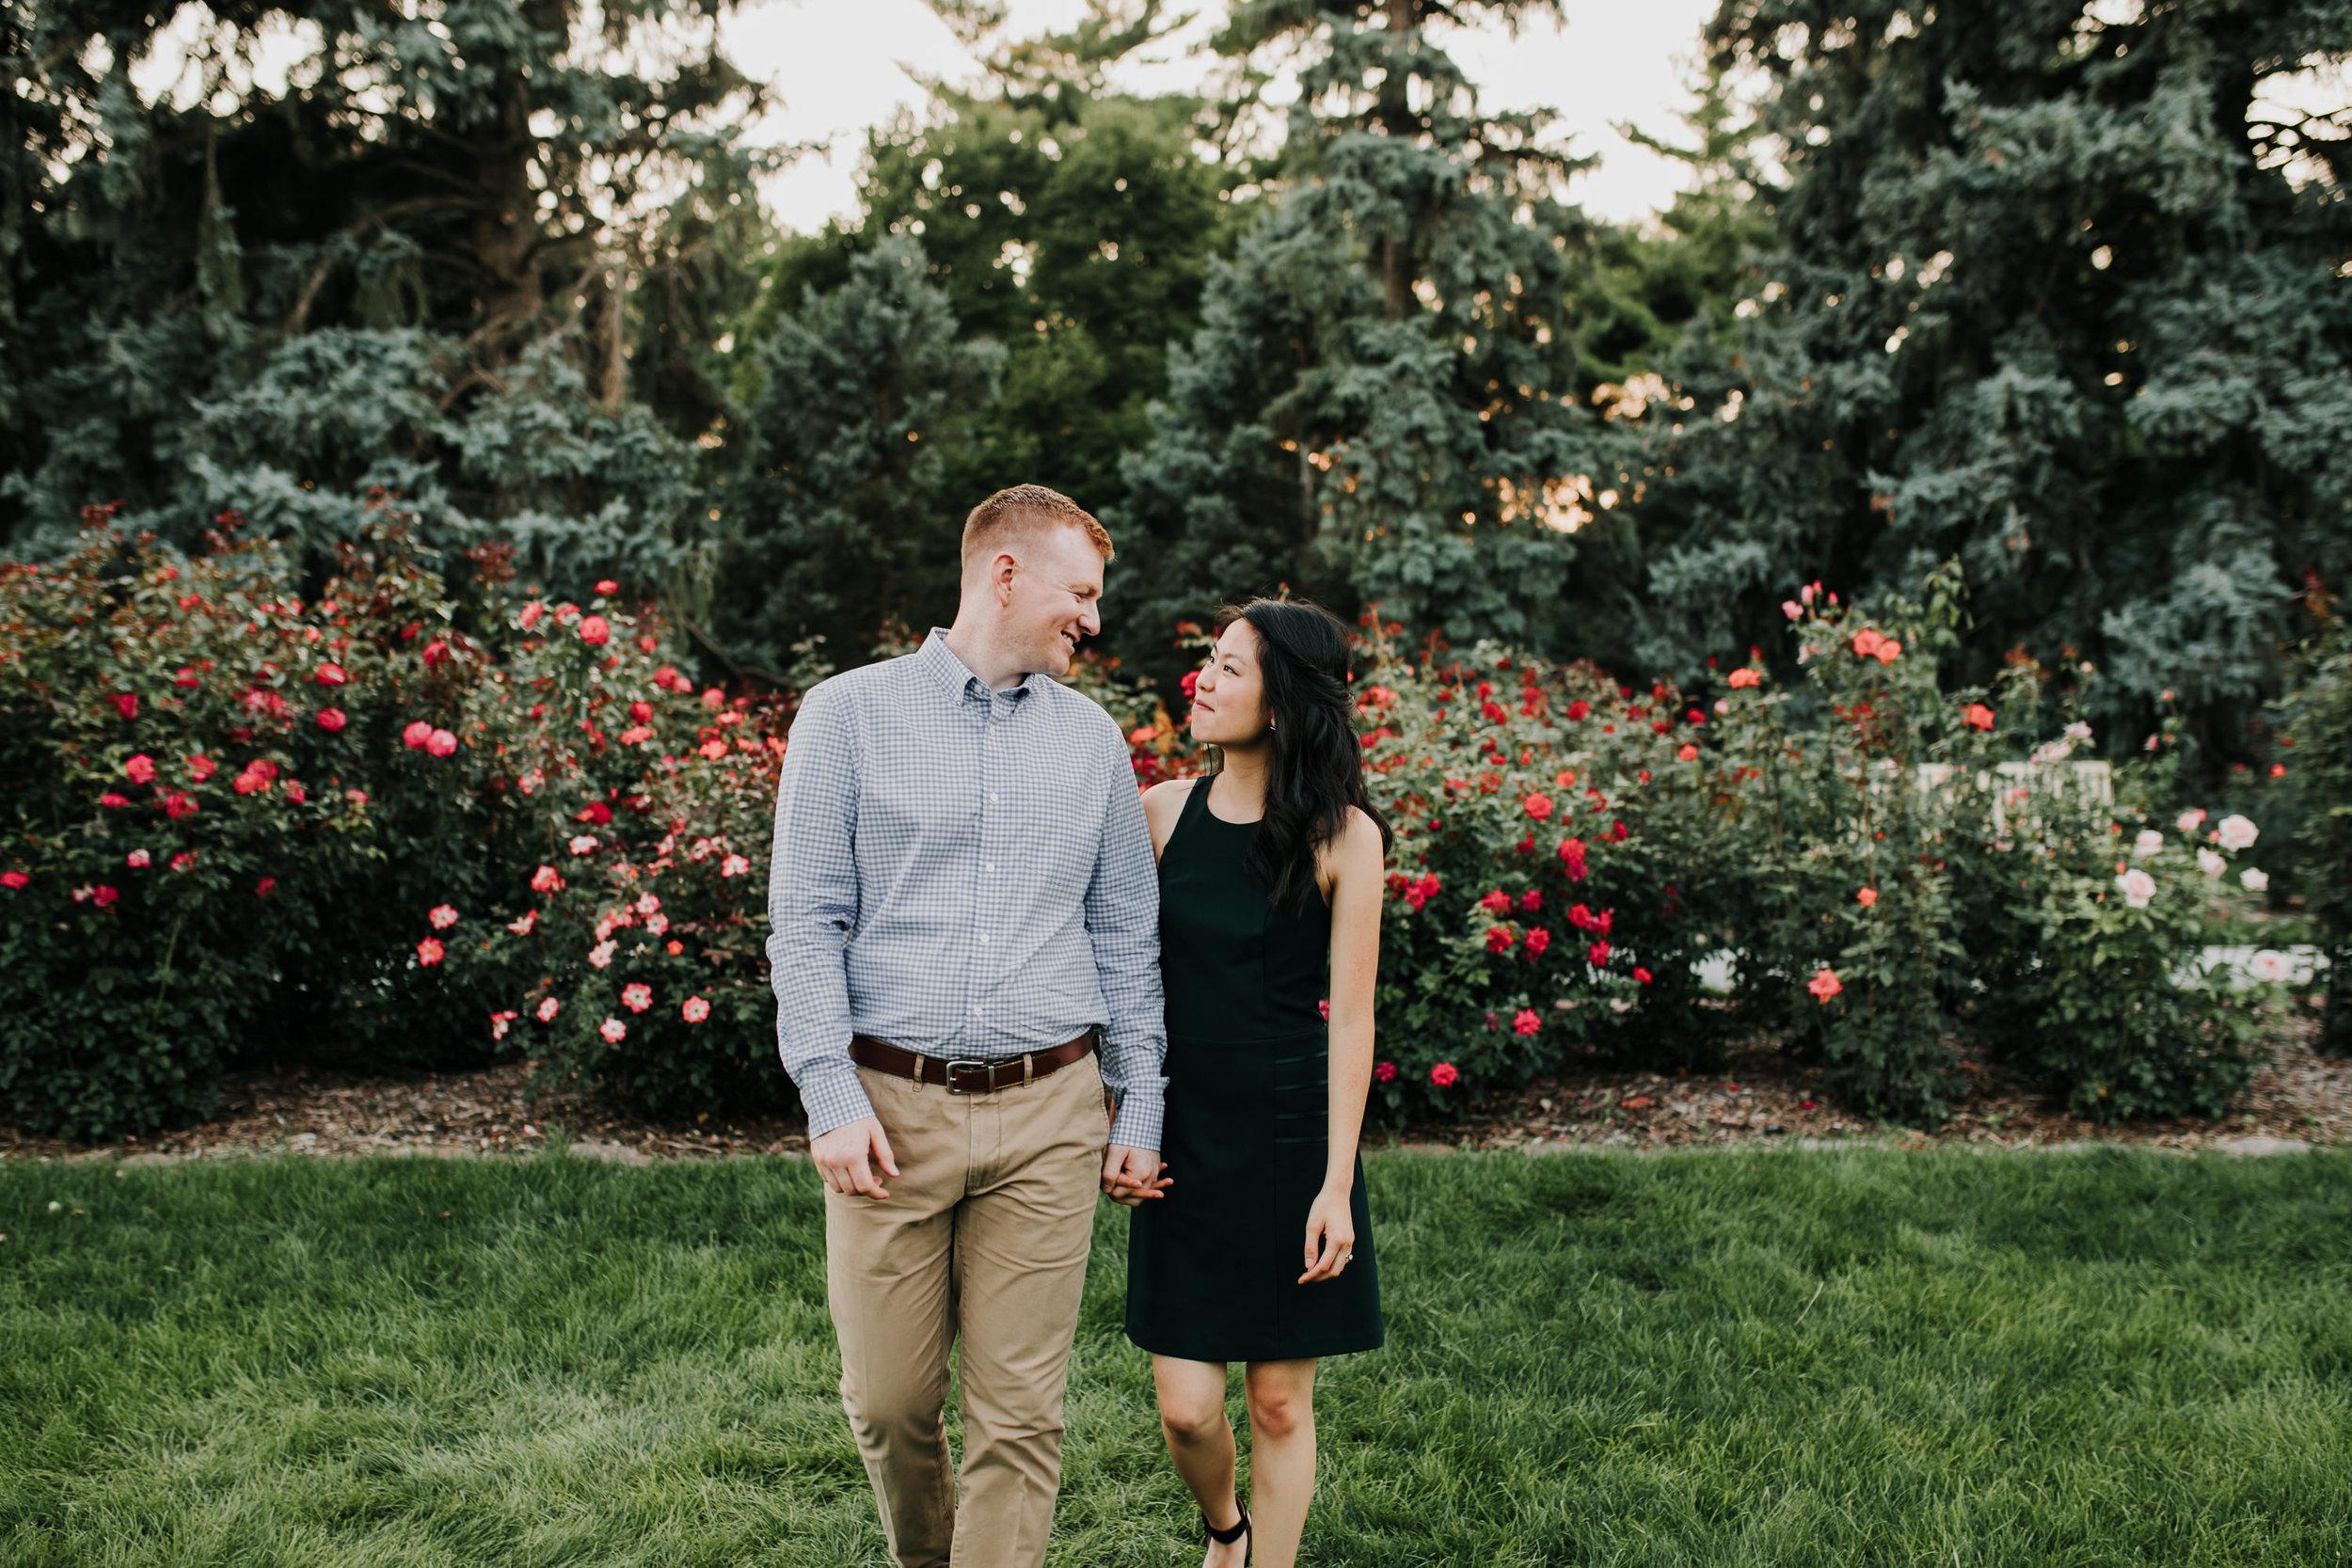 Catherin & Kyle - Married - Nathaniel Jensen Photography - Omaha Nebraska Wedding Photograper - Memorial Park - Joslyn Castle Engagement Session-68.jpg